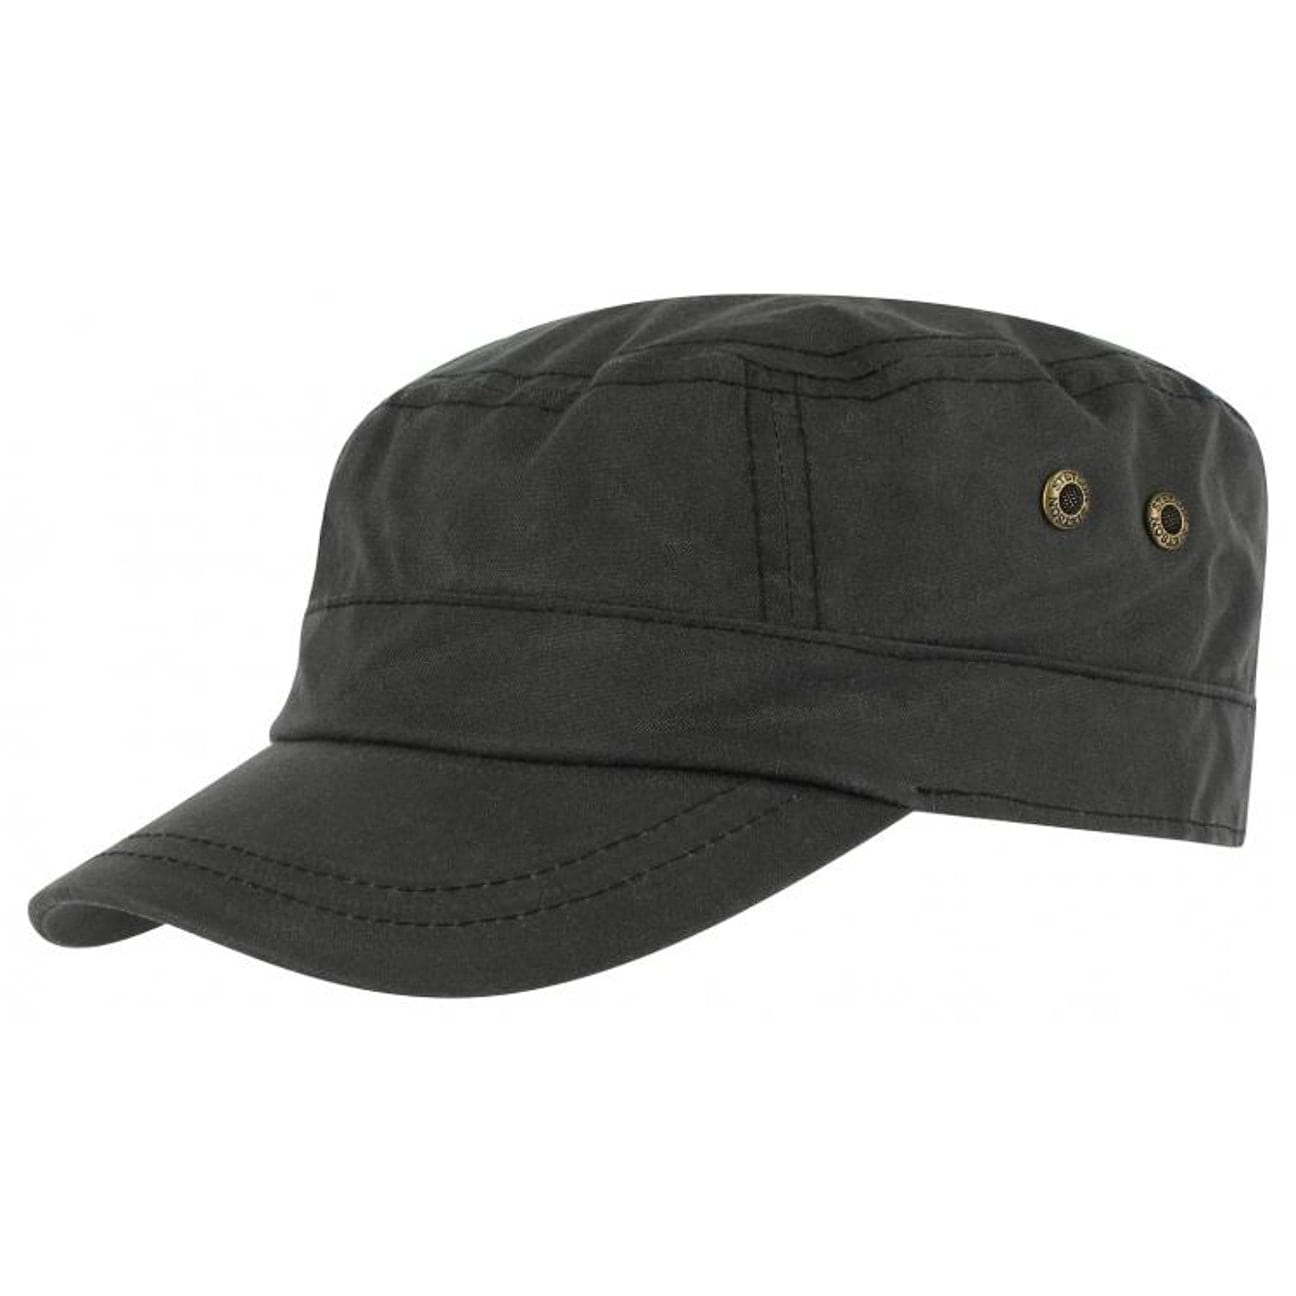 09d9c556 ... Austin Waxed Cotton Army Cap by Stetson - black 1